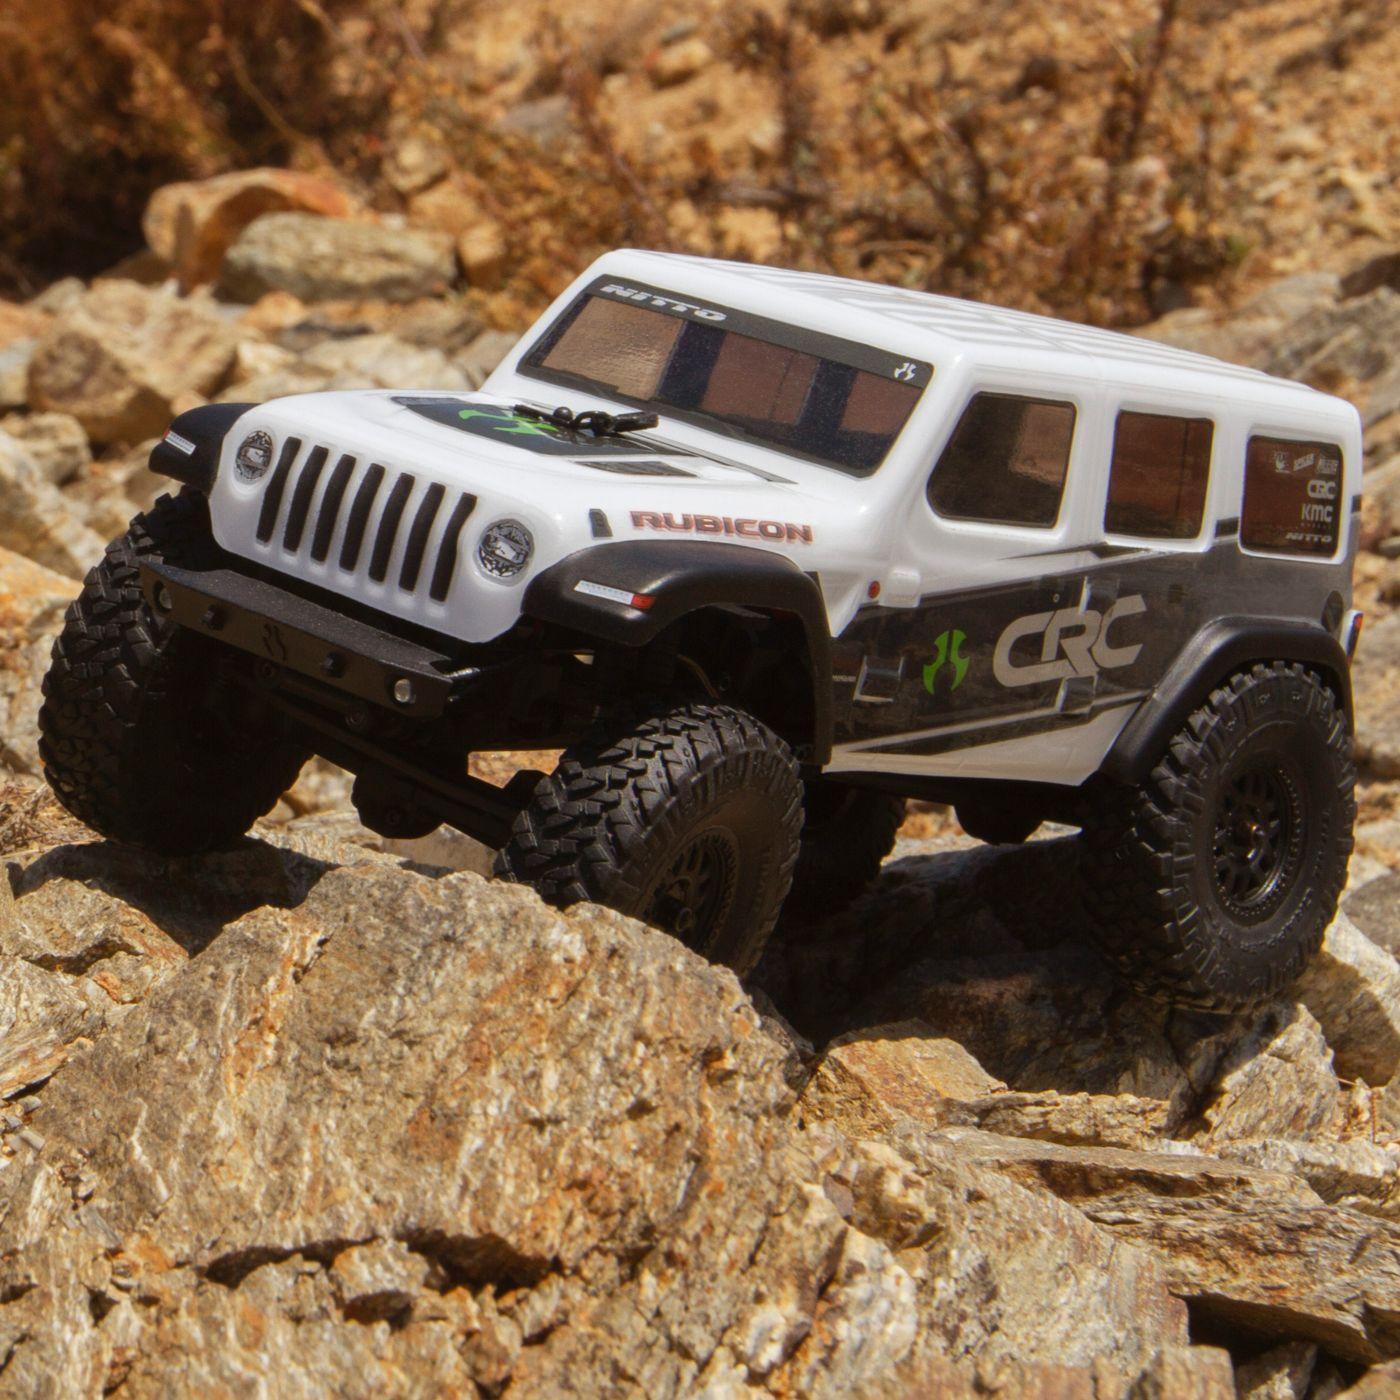 Axial Scx24 Jeep Wrangler 4x4 rtr scaler 1/24 01